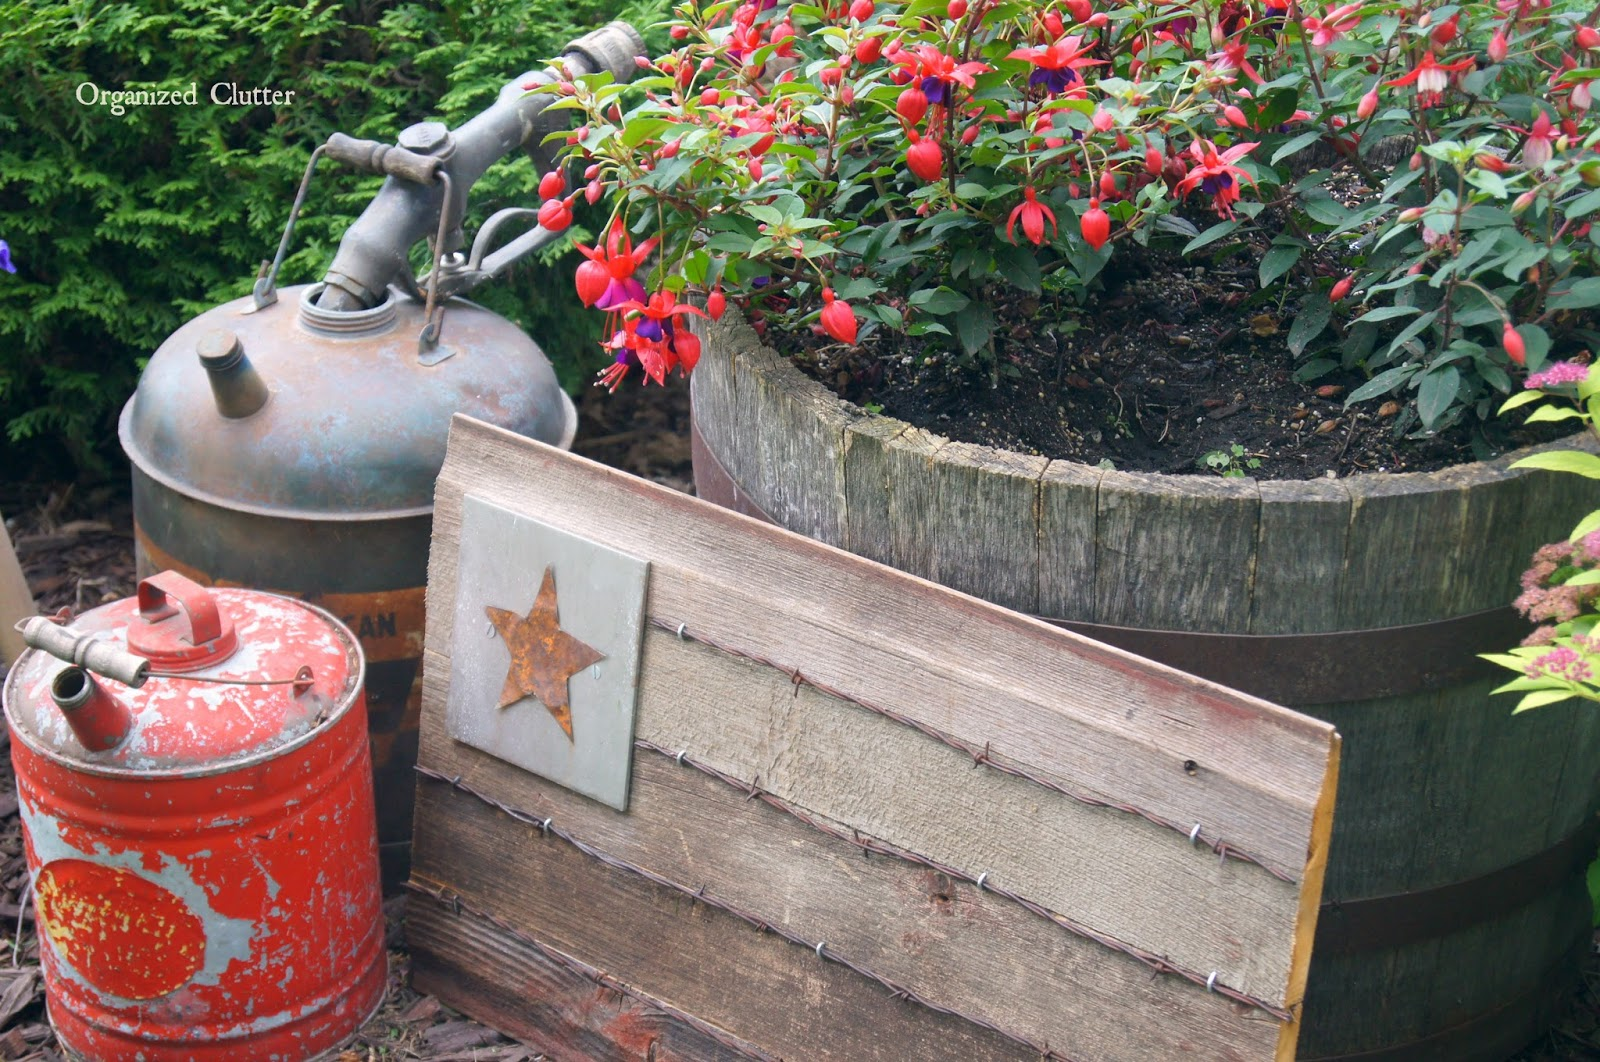 Oil Cans, Rustic Flag & Gas Nozzle www.organizedclutterqueen.blogspot.com